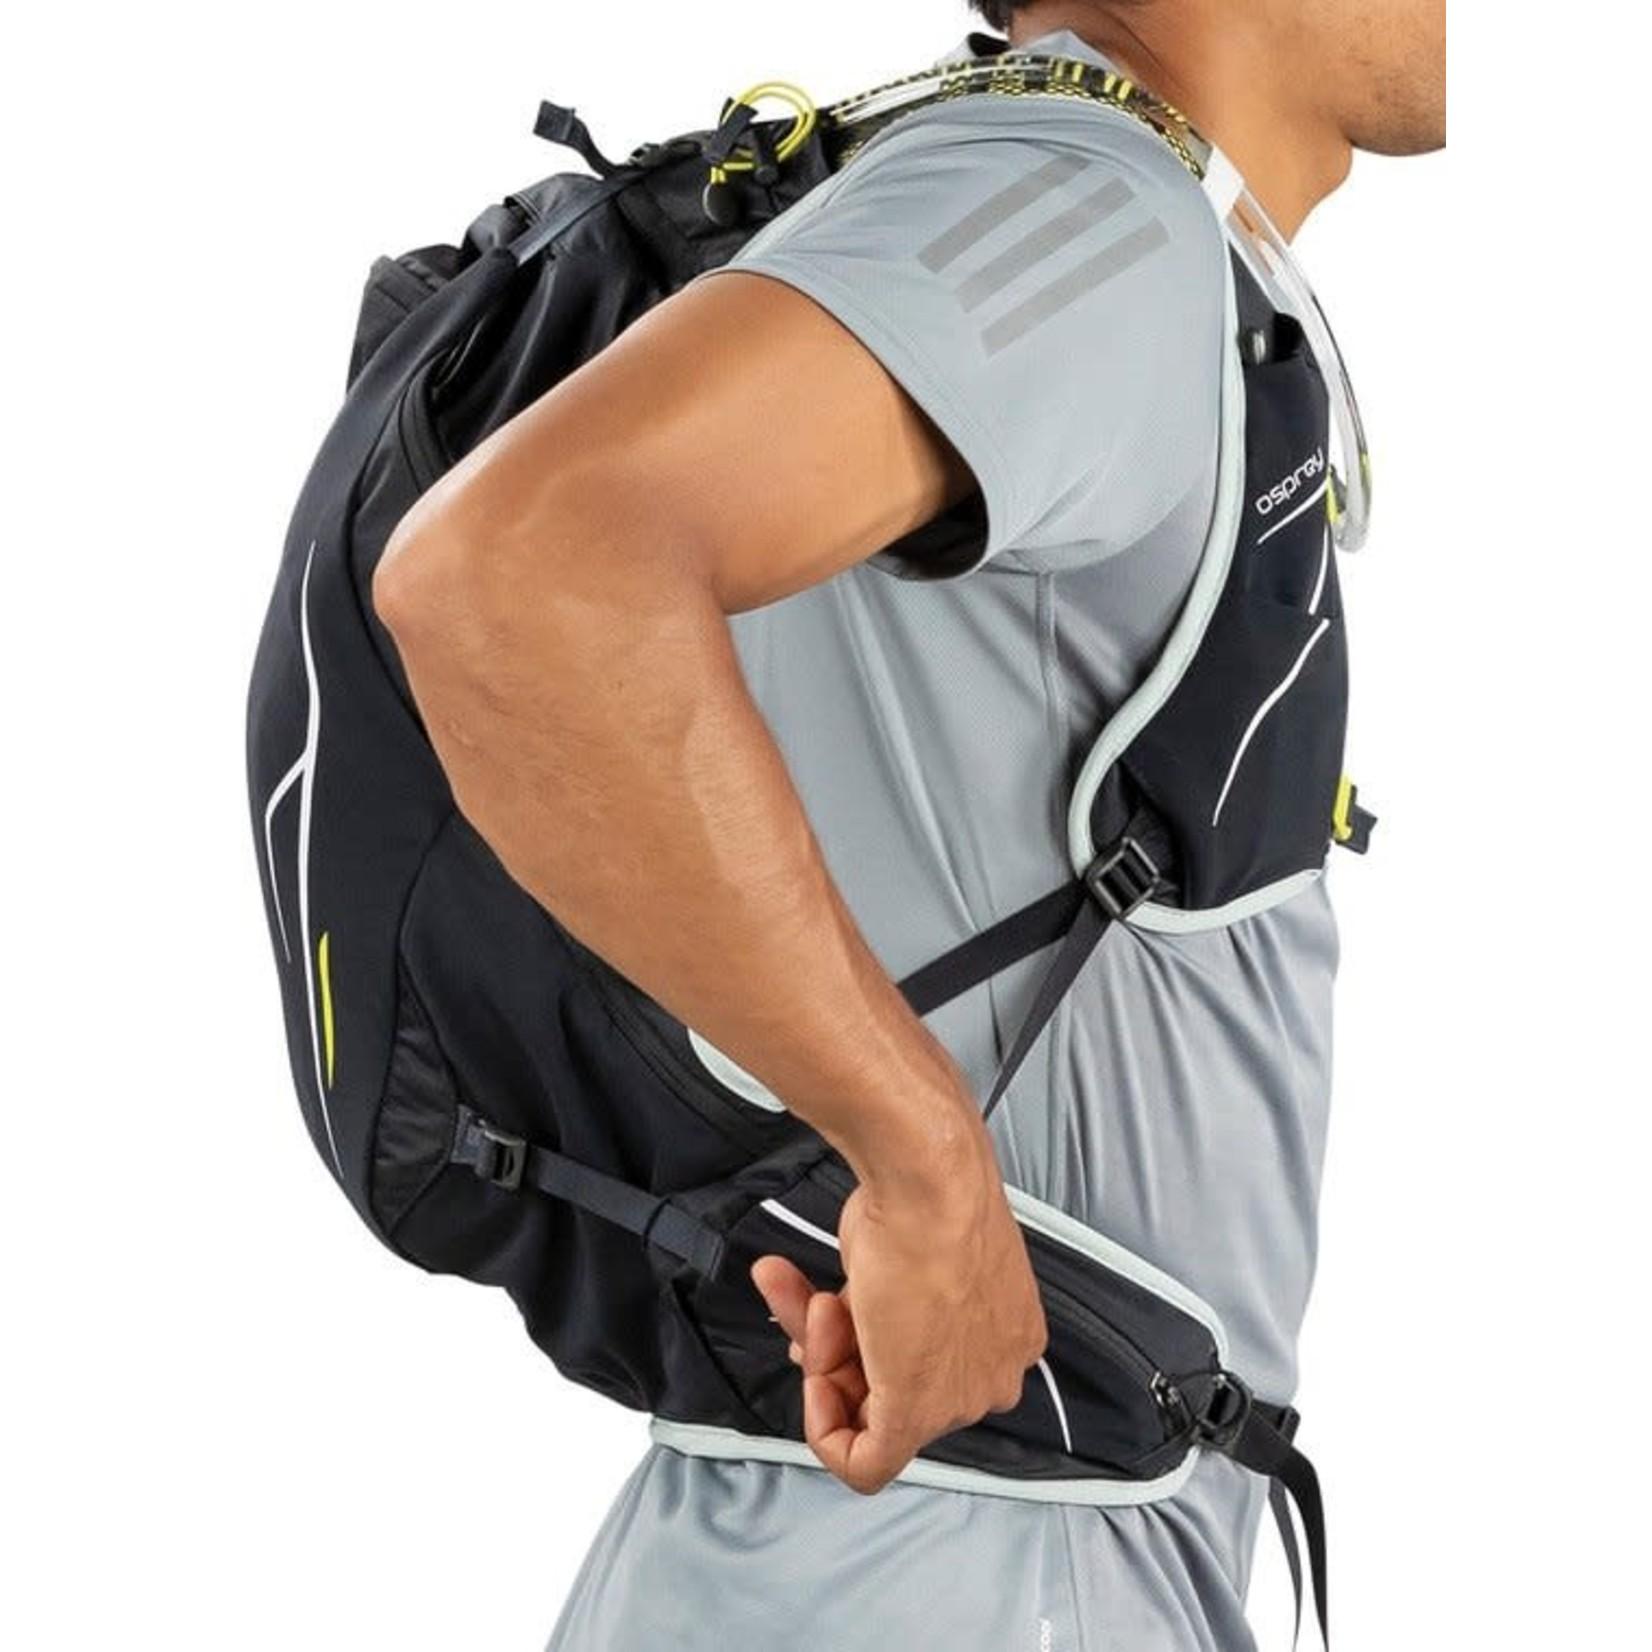 Osprey Osprey Duro 15 Running Vest - Men